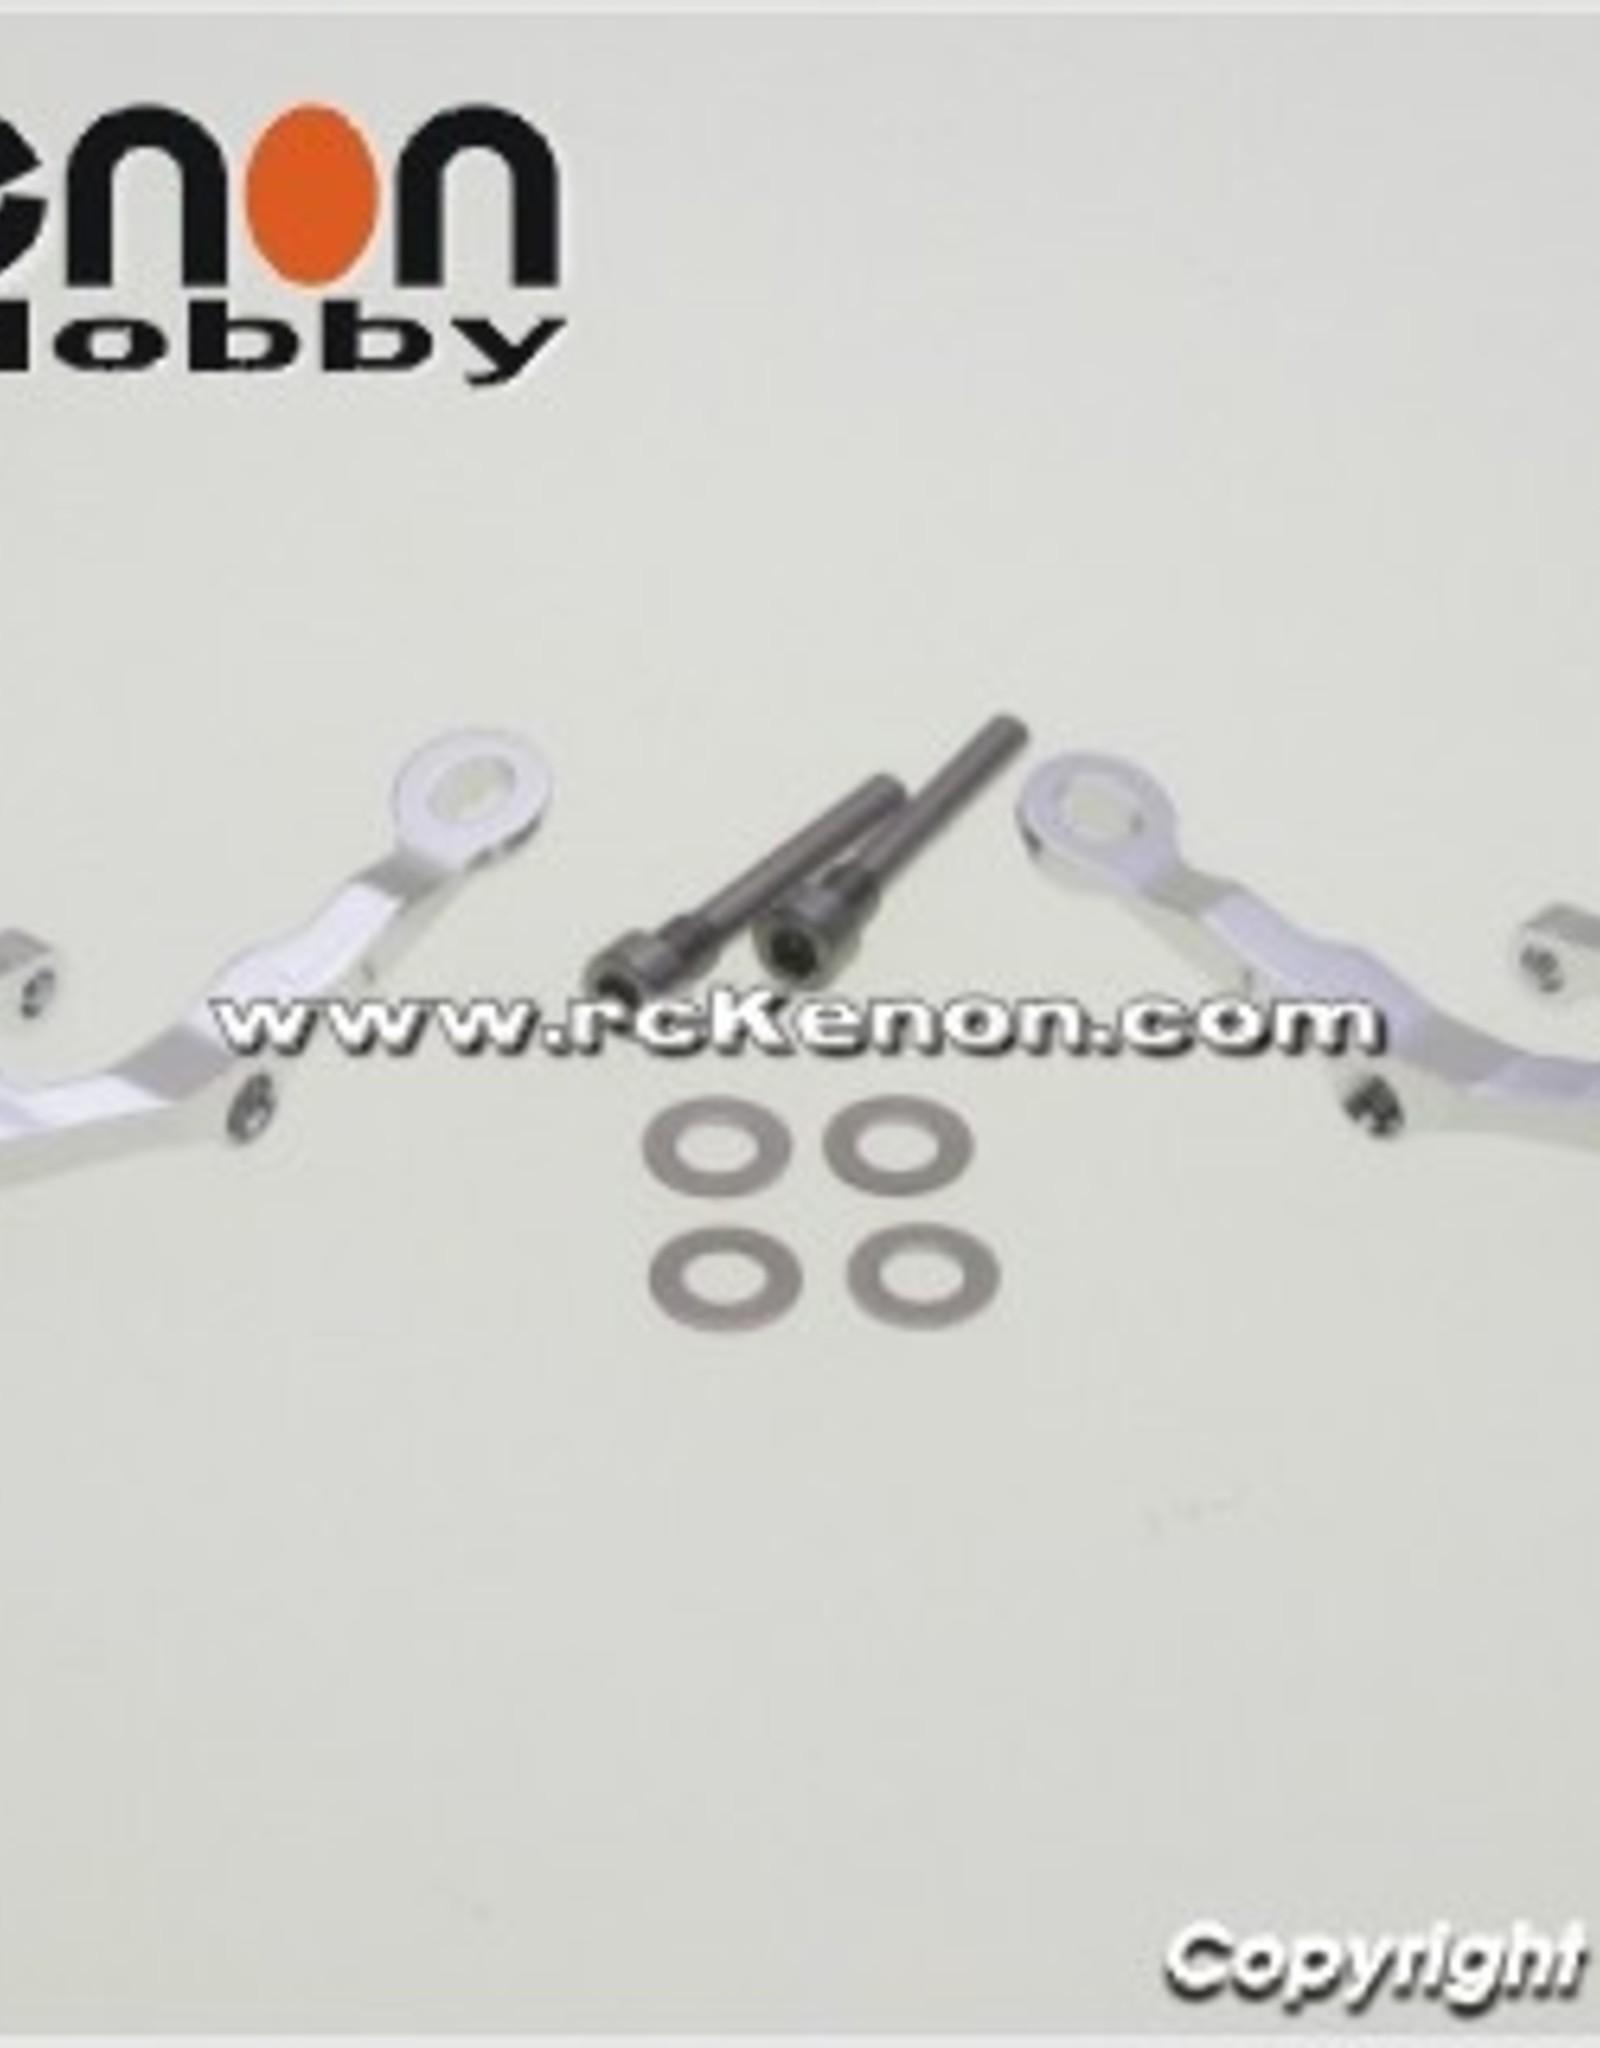 Pn Racing PN Racing Mini-Z MR03 Alum Caster Upper Arm 0 Camber (Silver)